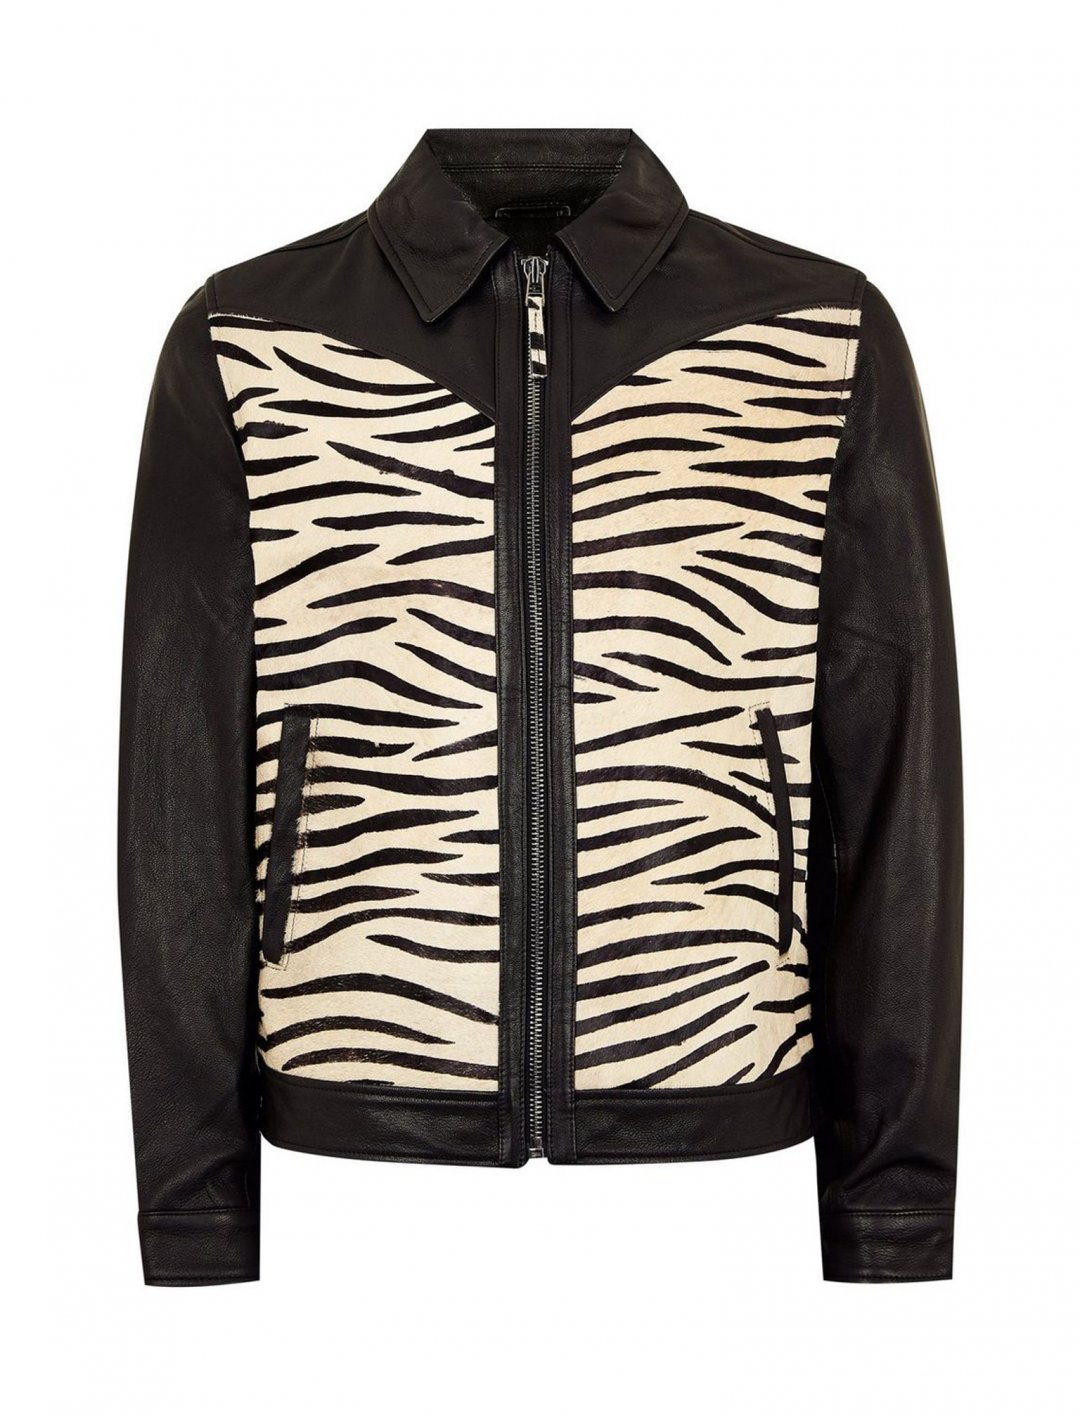 "Zebra Print Jacket {""id"":5,""product_section_id"":1,""name"":""Clothing"",""order"":5} Topman"